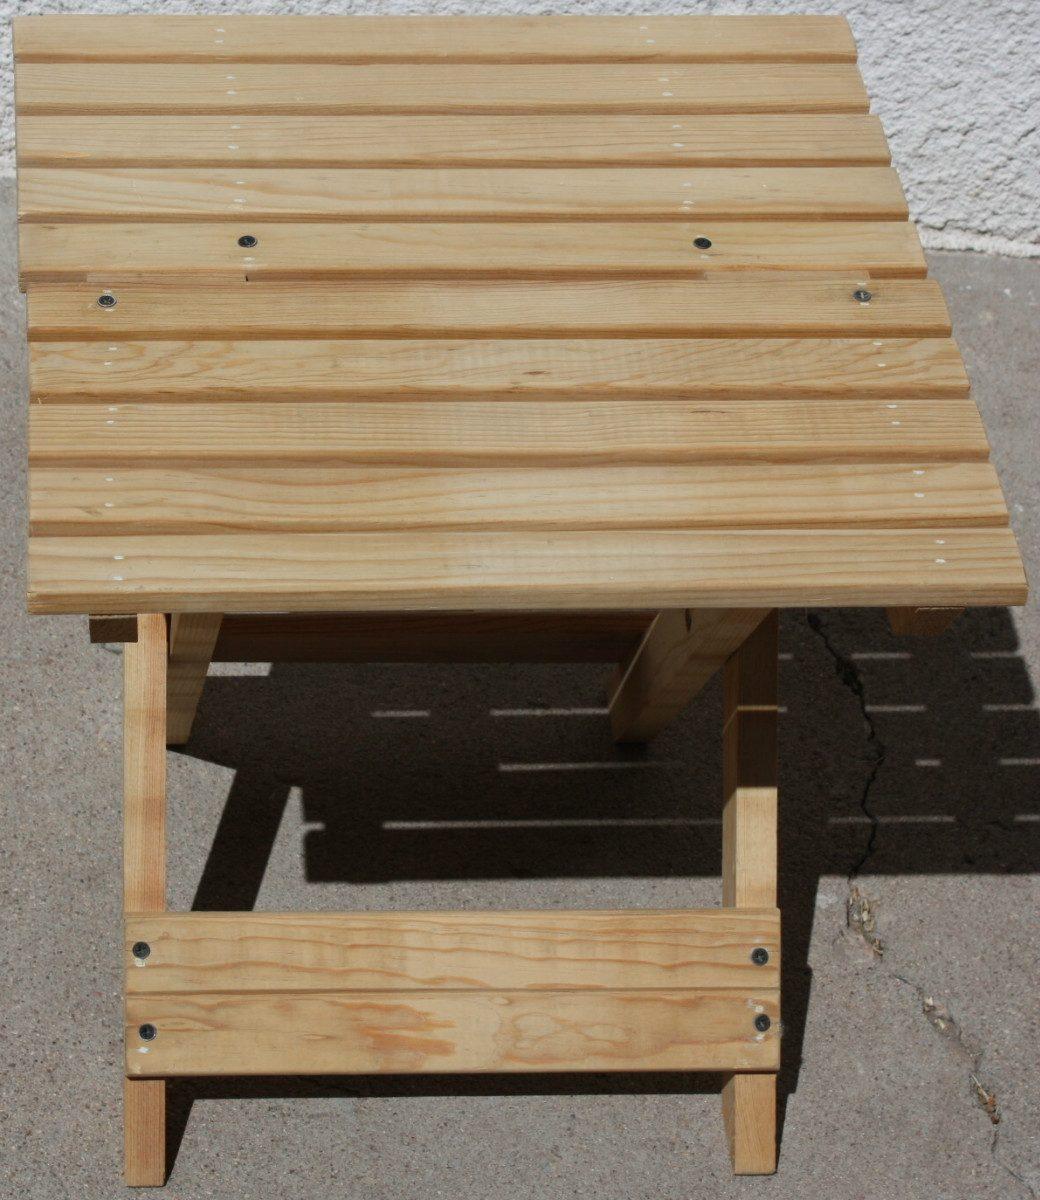 Banco de jard n mueble plegable madera jardin interiores for Banco madera jardin carrefour